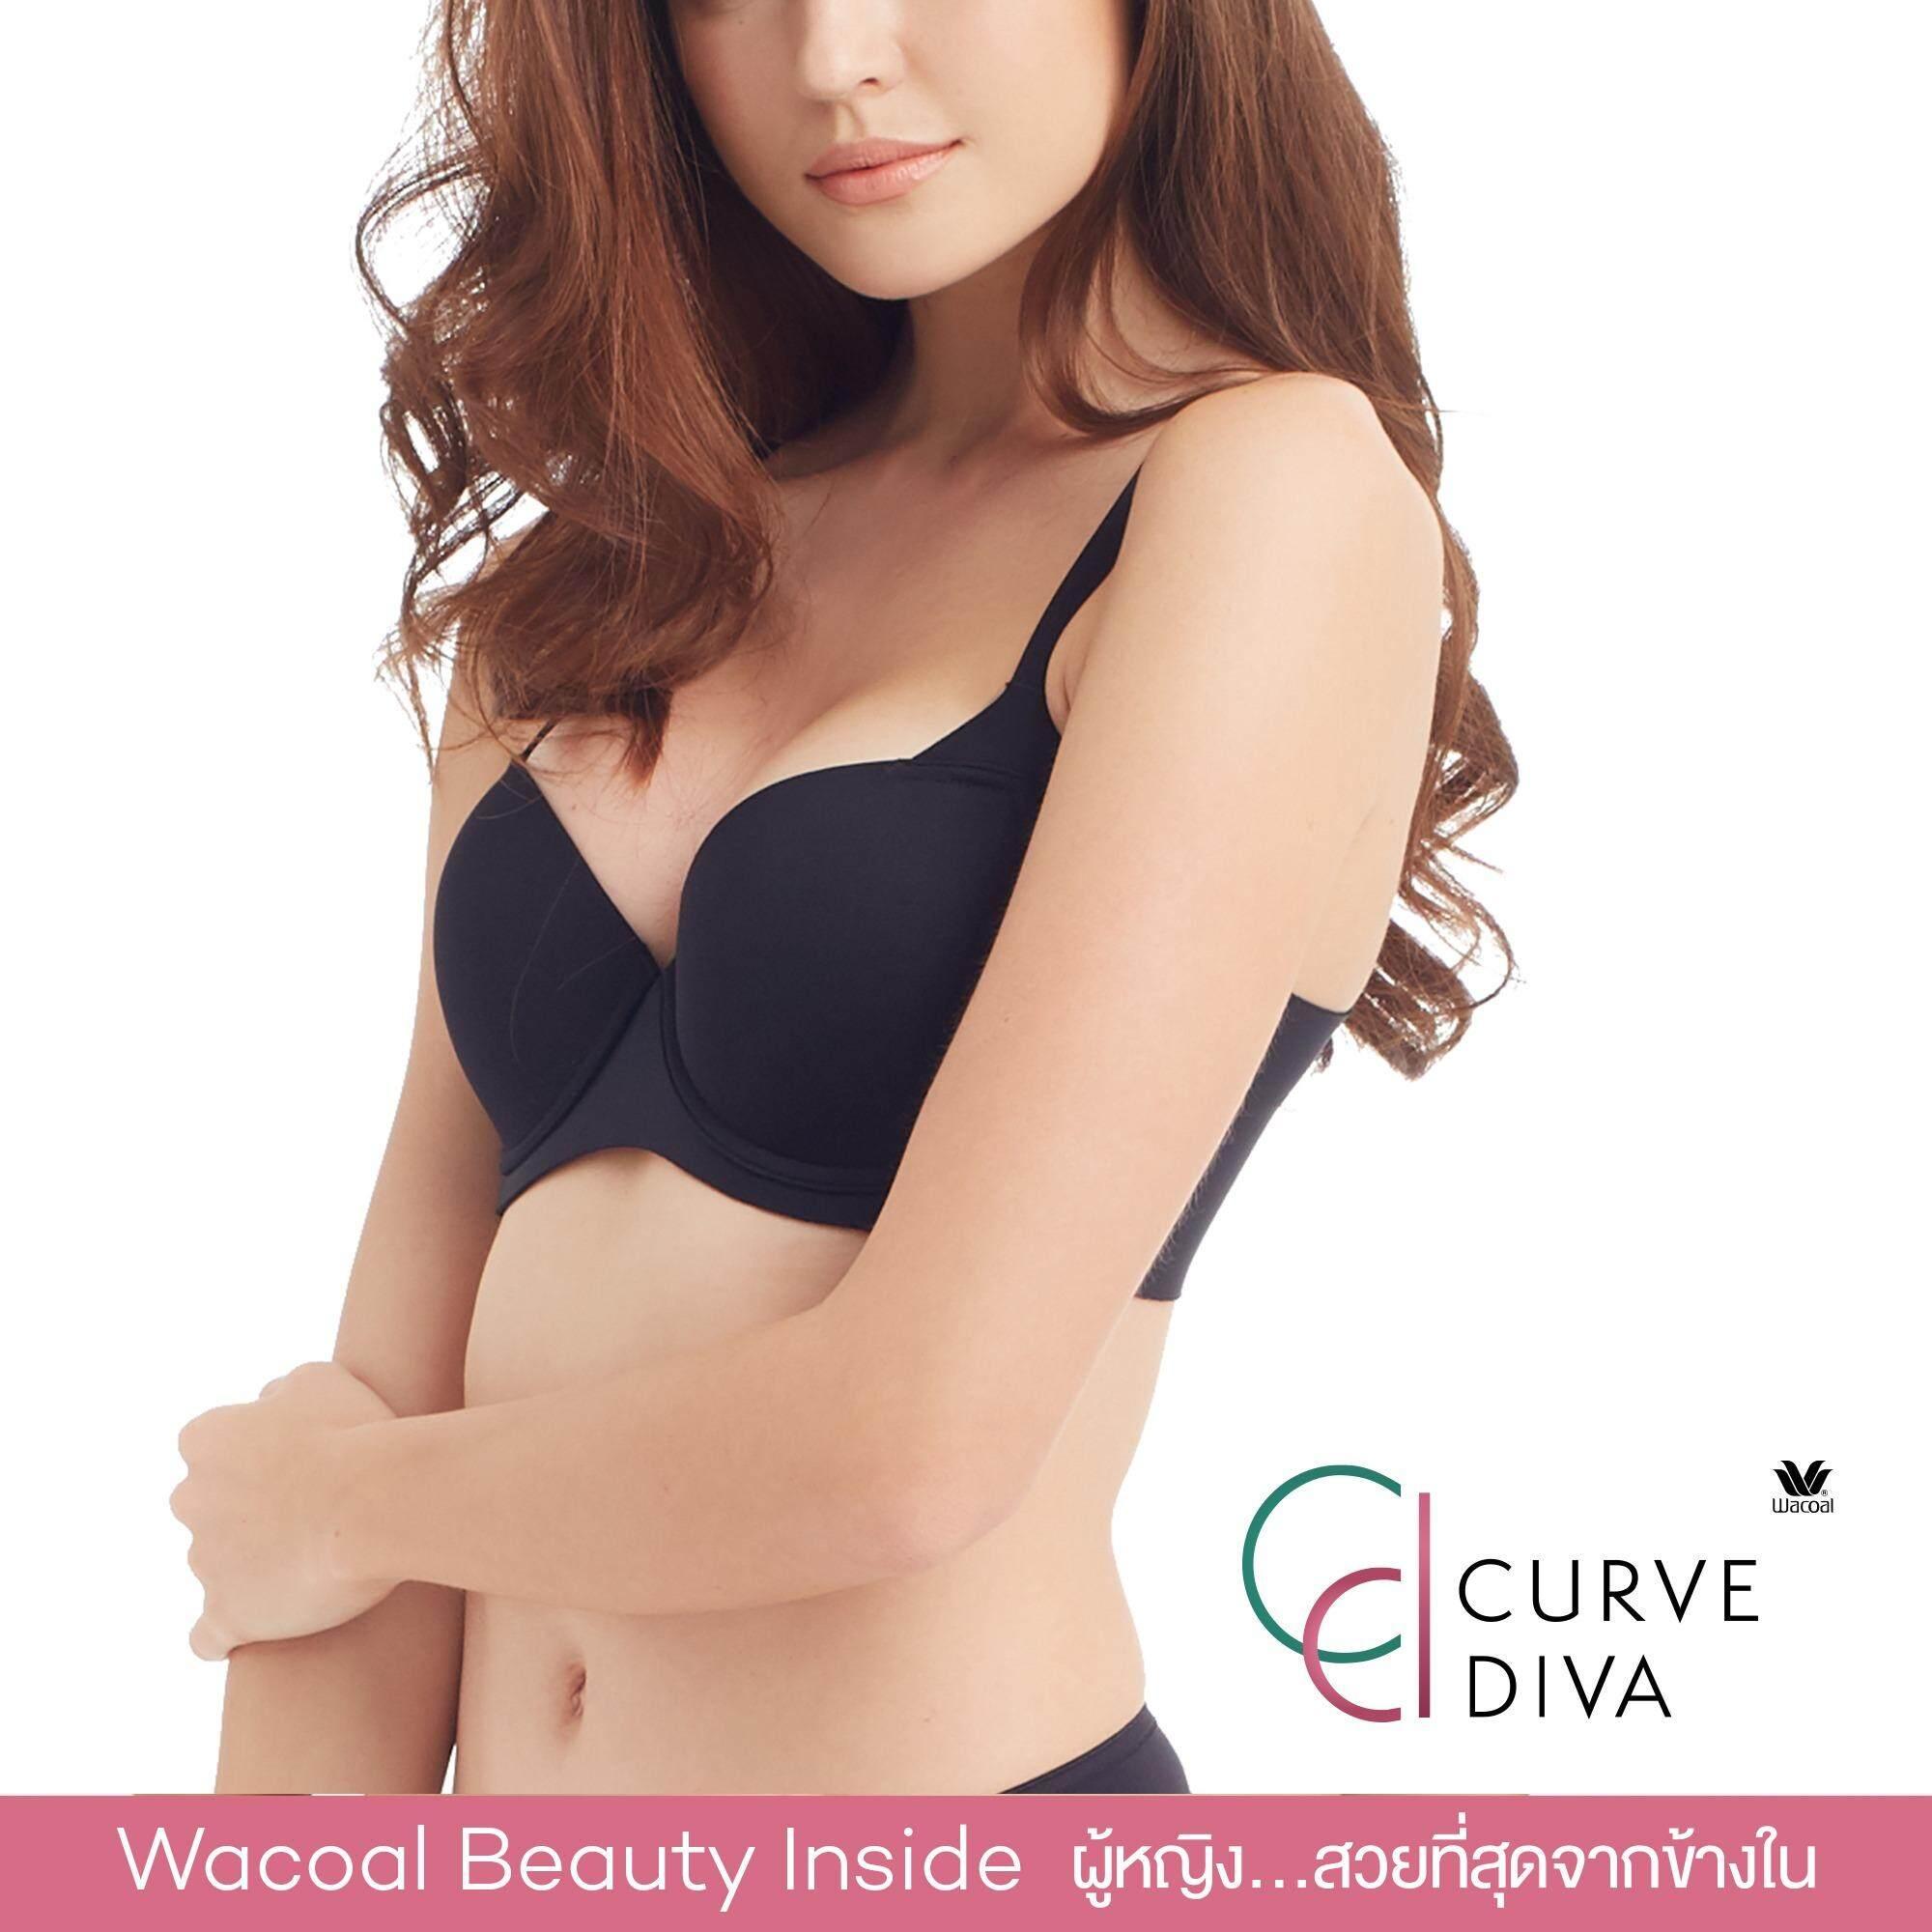 Wacoal Curve Diva Seamless bra 4/5 Cup (สีดำ/BLACK) - WB7914BL